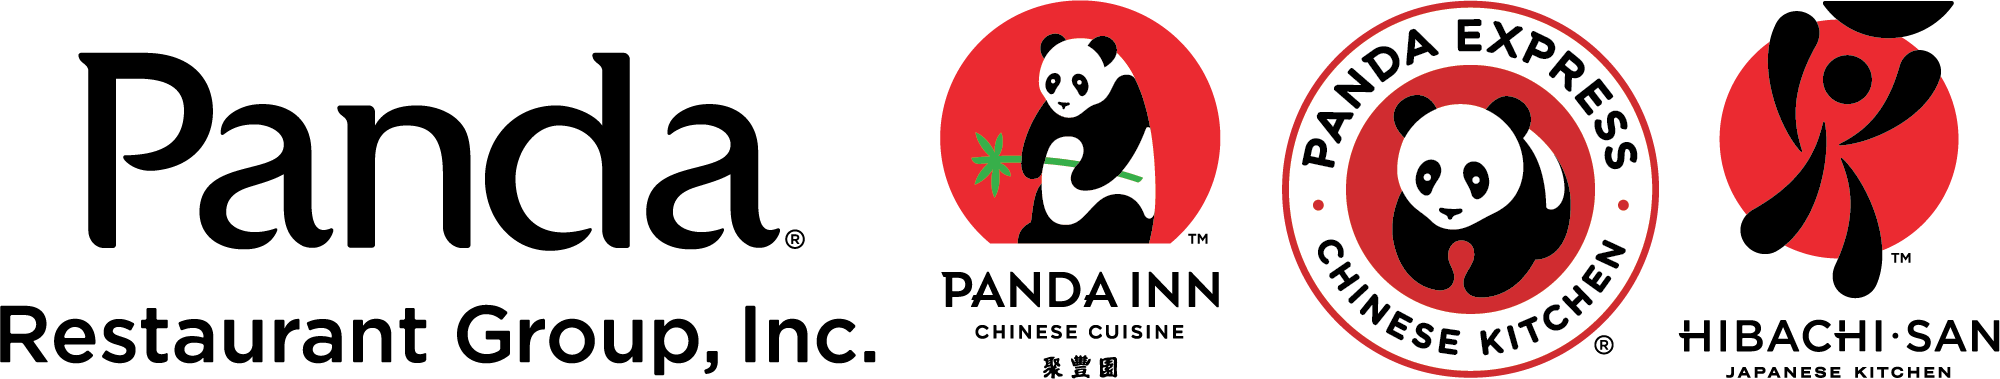 Panda Restaurant Group Company Logo